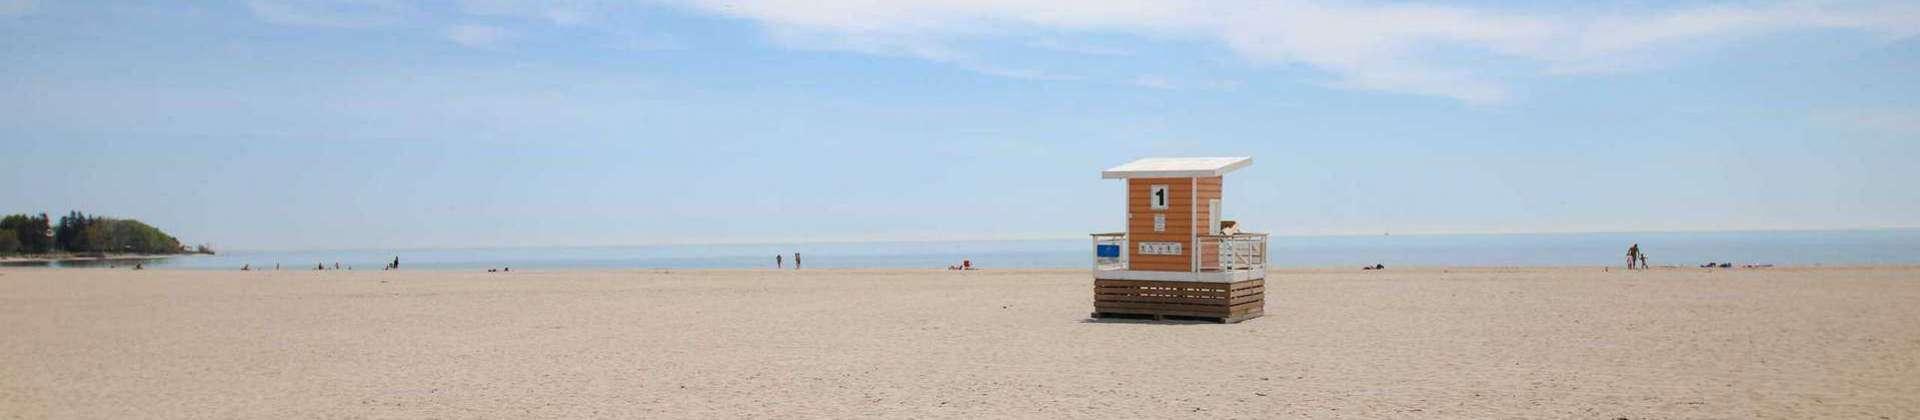 Cobourg Ontario beach